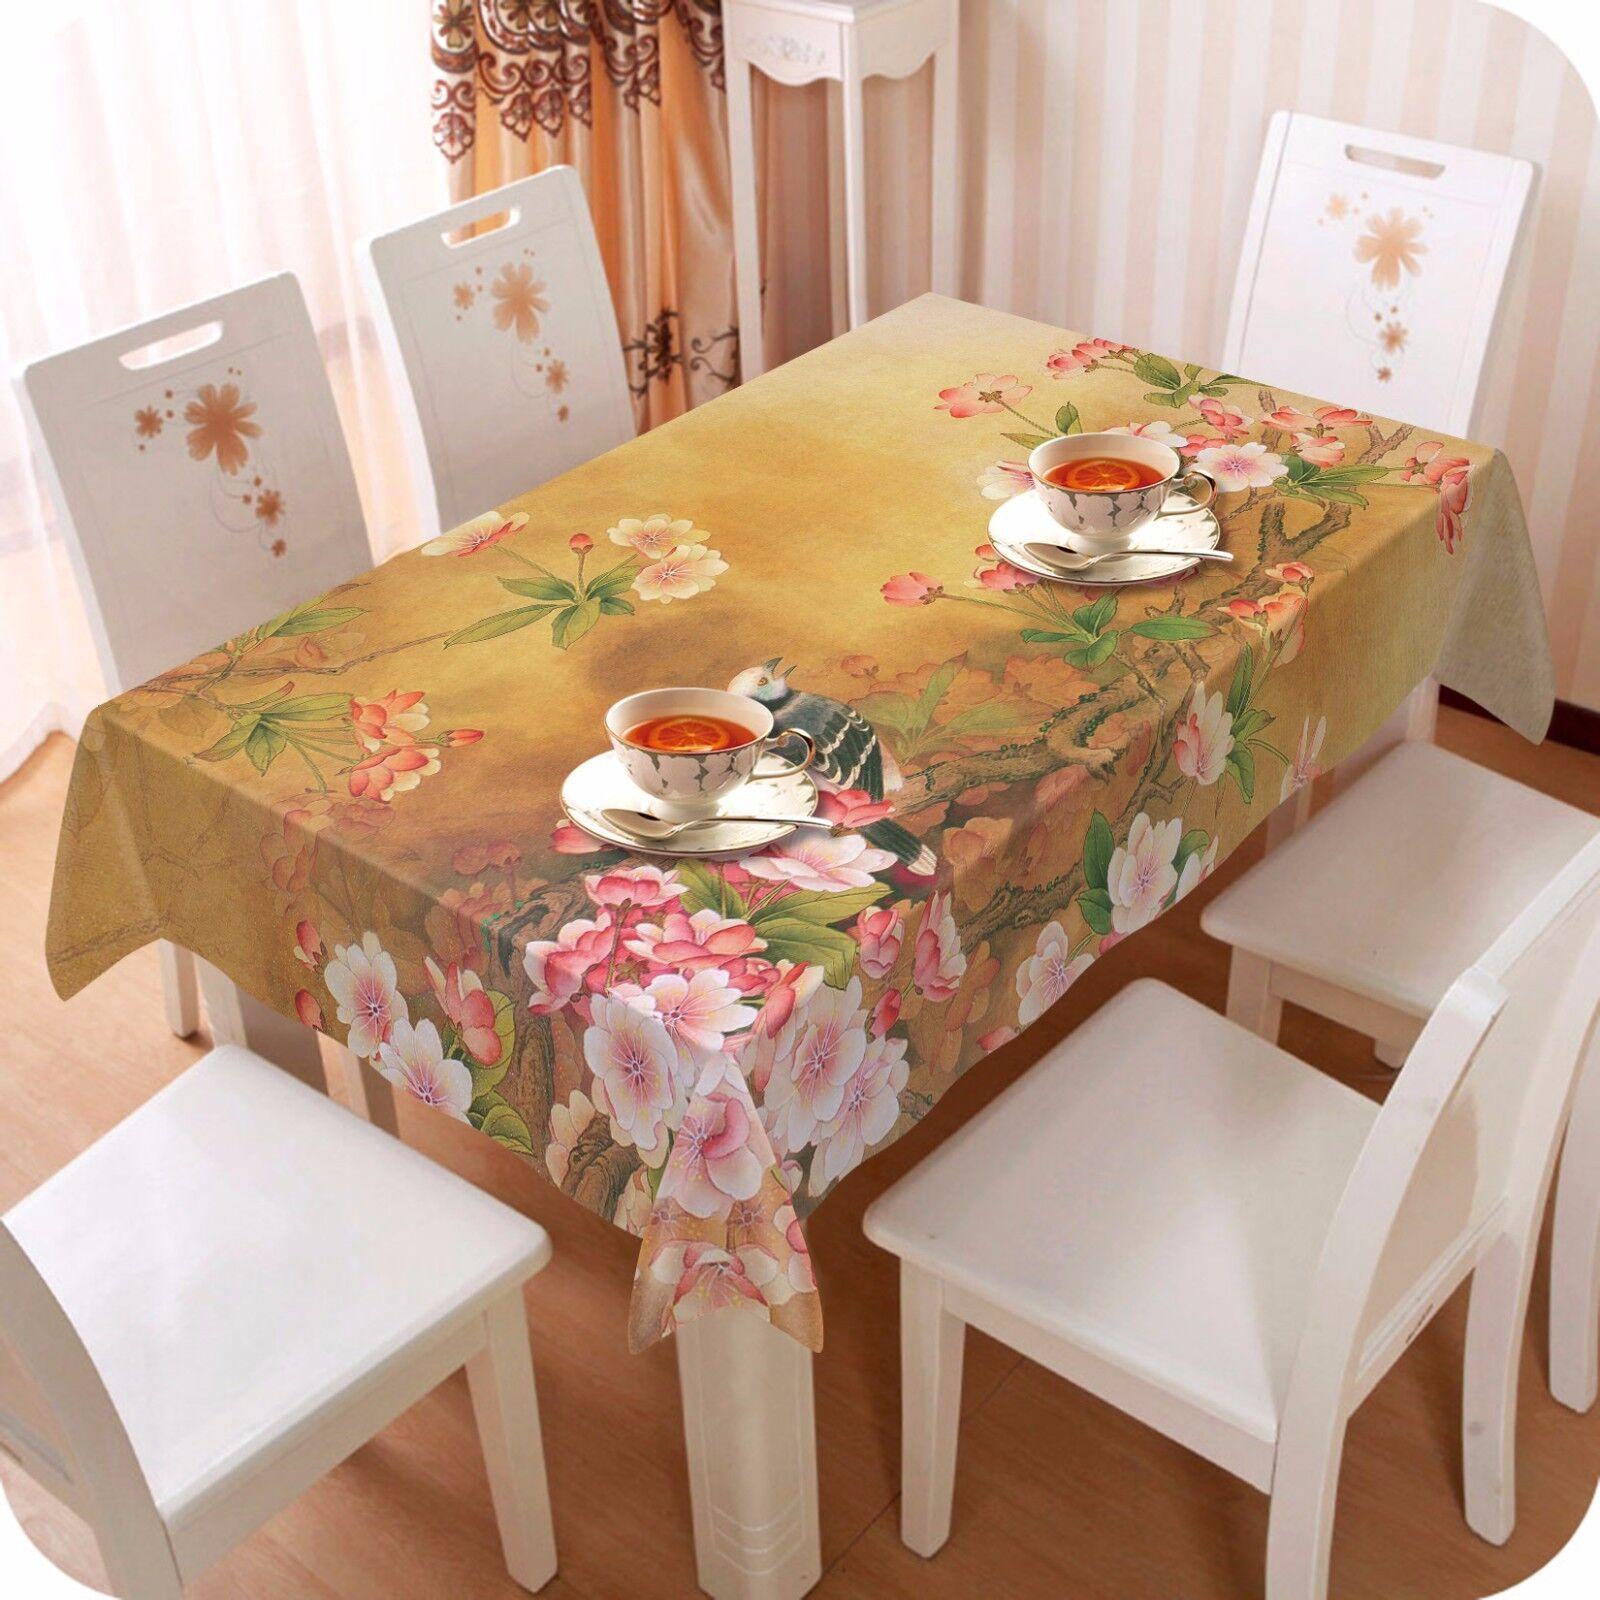 3D Bird 7458 Tablecloth Table Cover Cloth Birthday Party Event AJ WALLPAPER AU